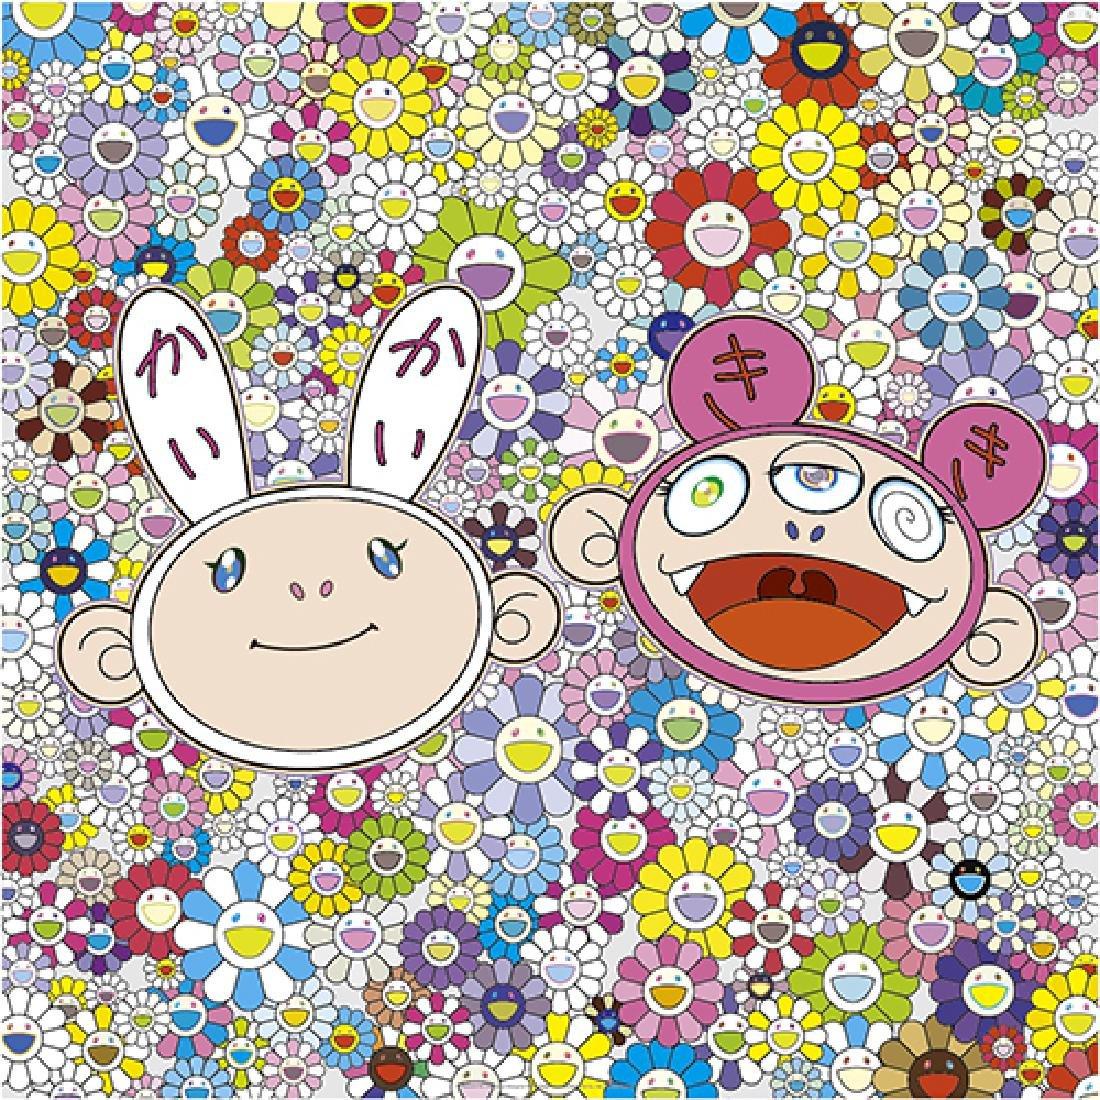 TAKASHI MURAKAMI  Kaikai & Kiki: Dreaming of Shangri-la